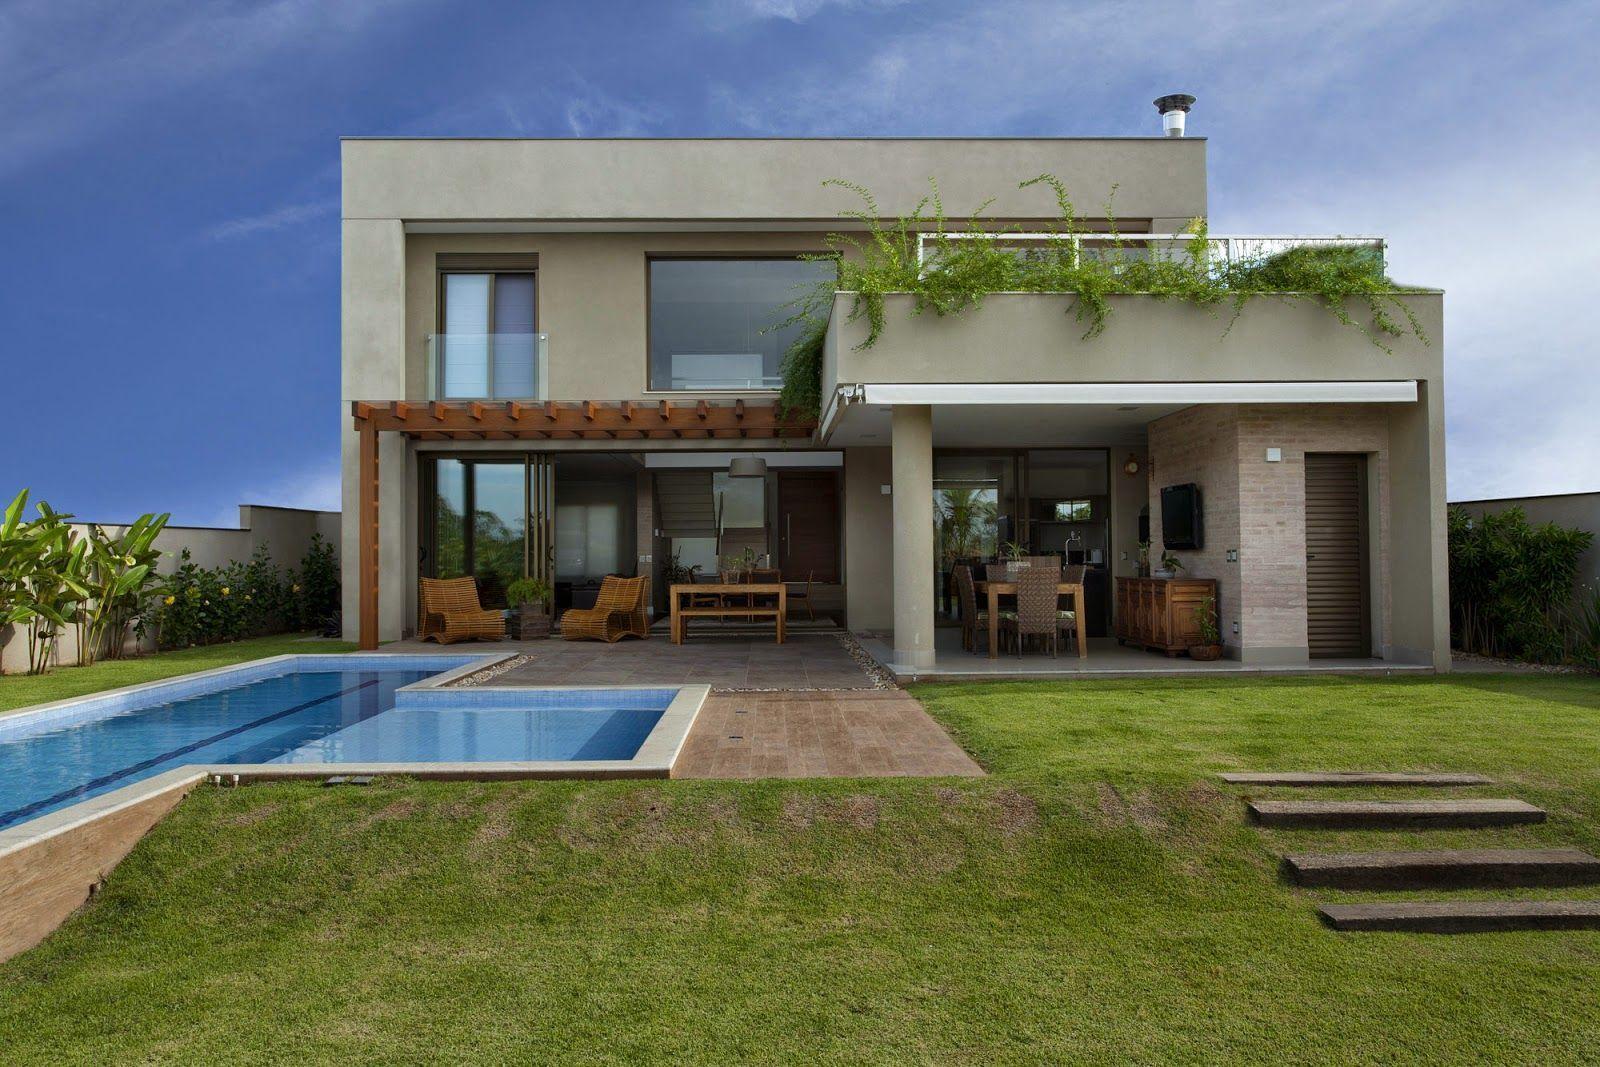 Imperd vel 110 refer ncias de casas bonitas para se inspirar Interiores de casas modernas 2016